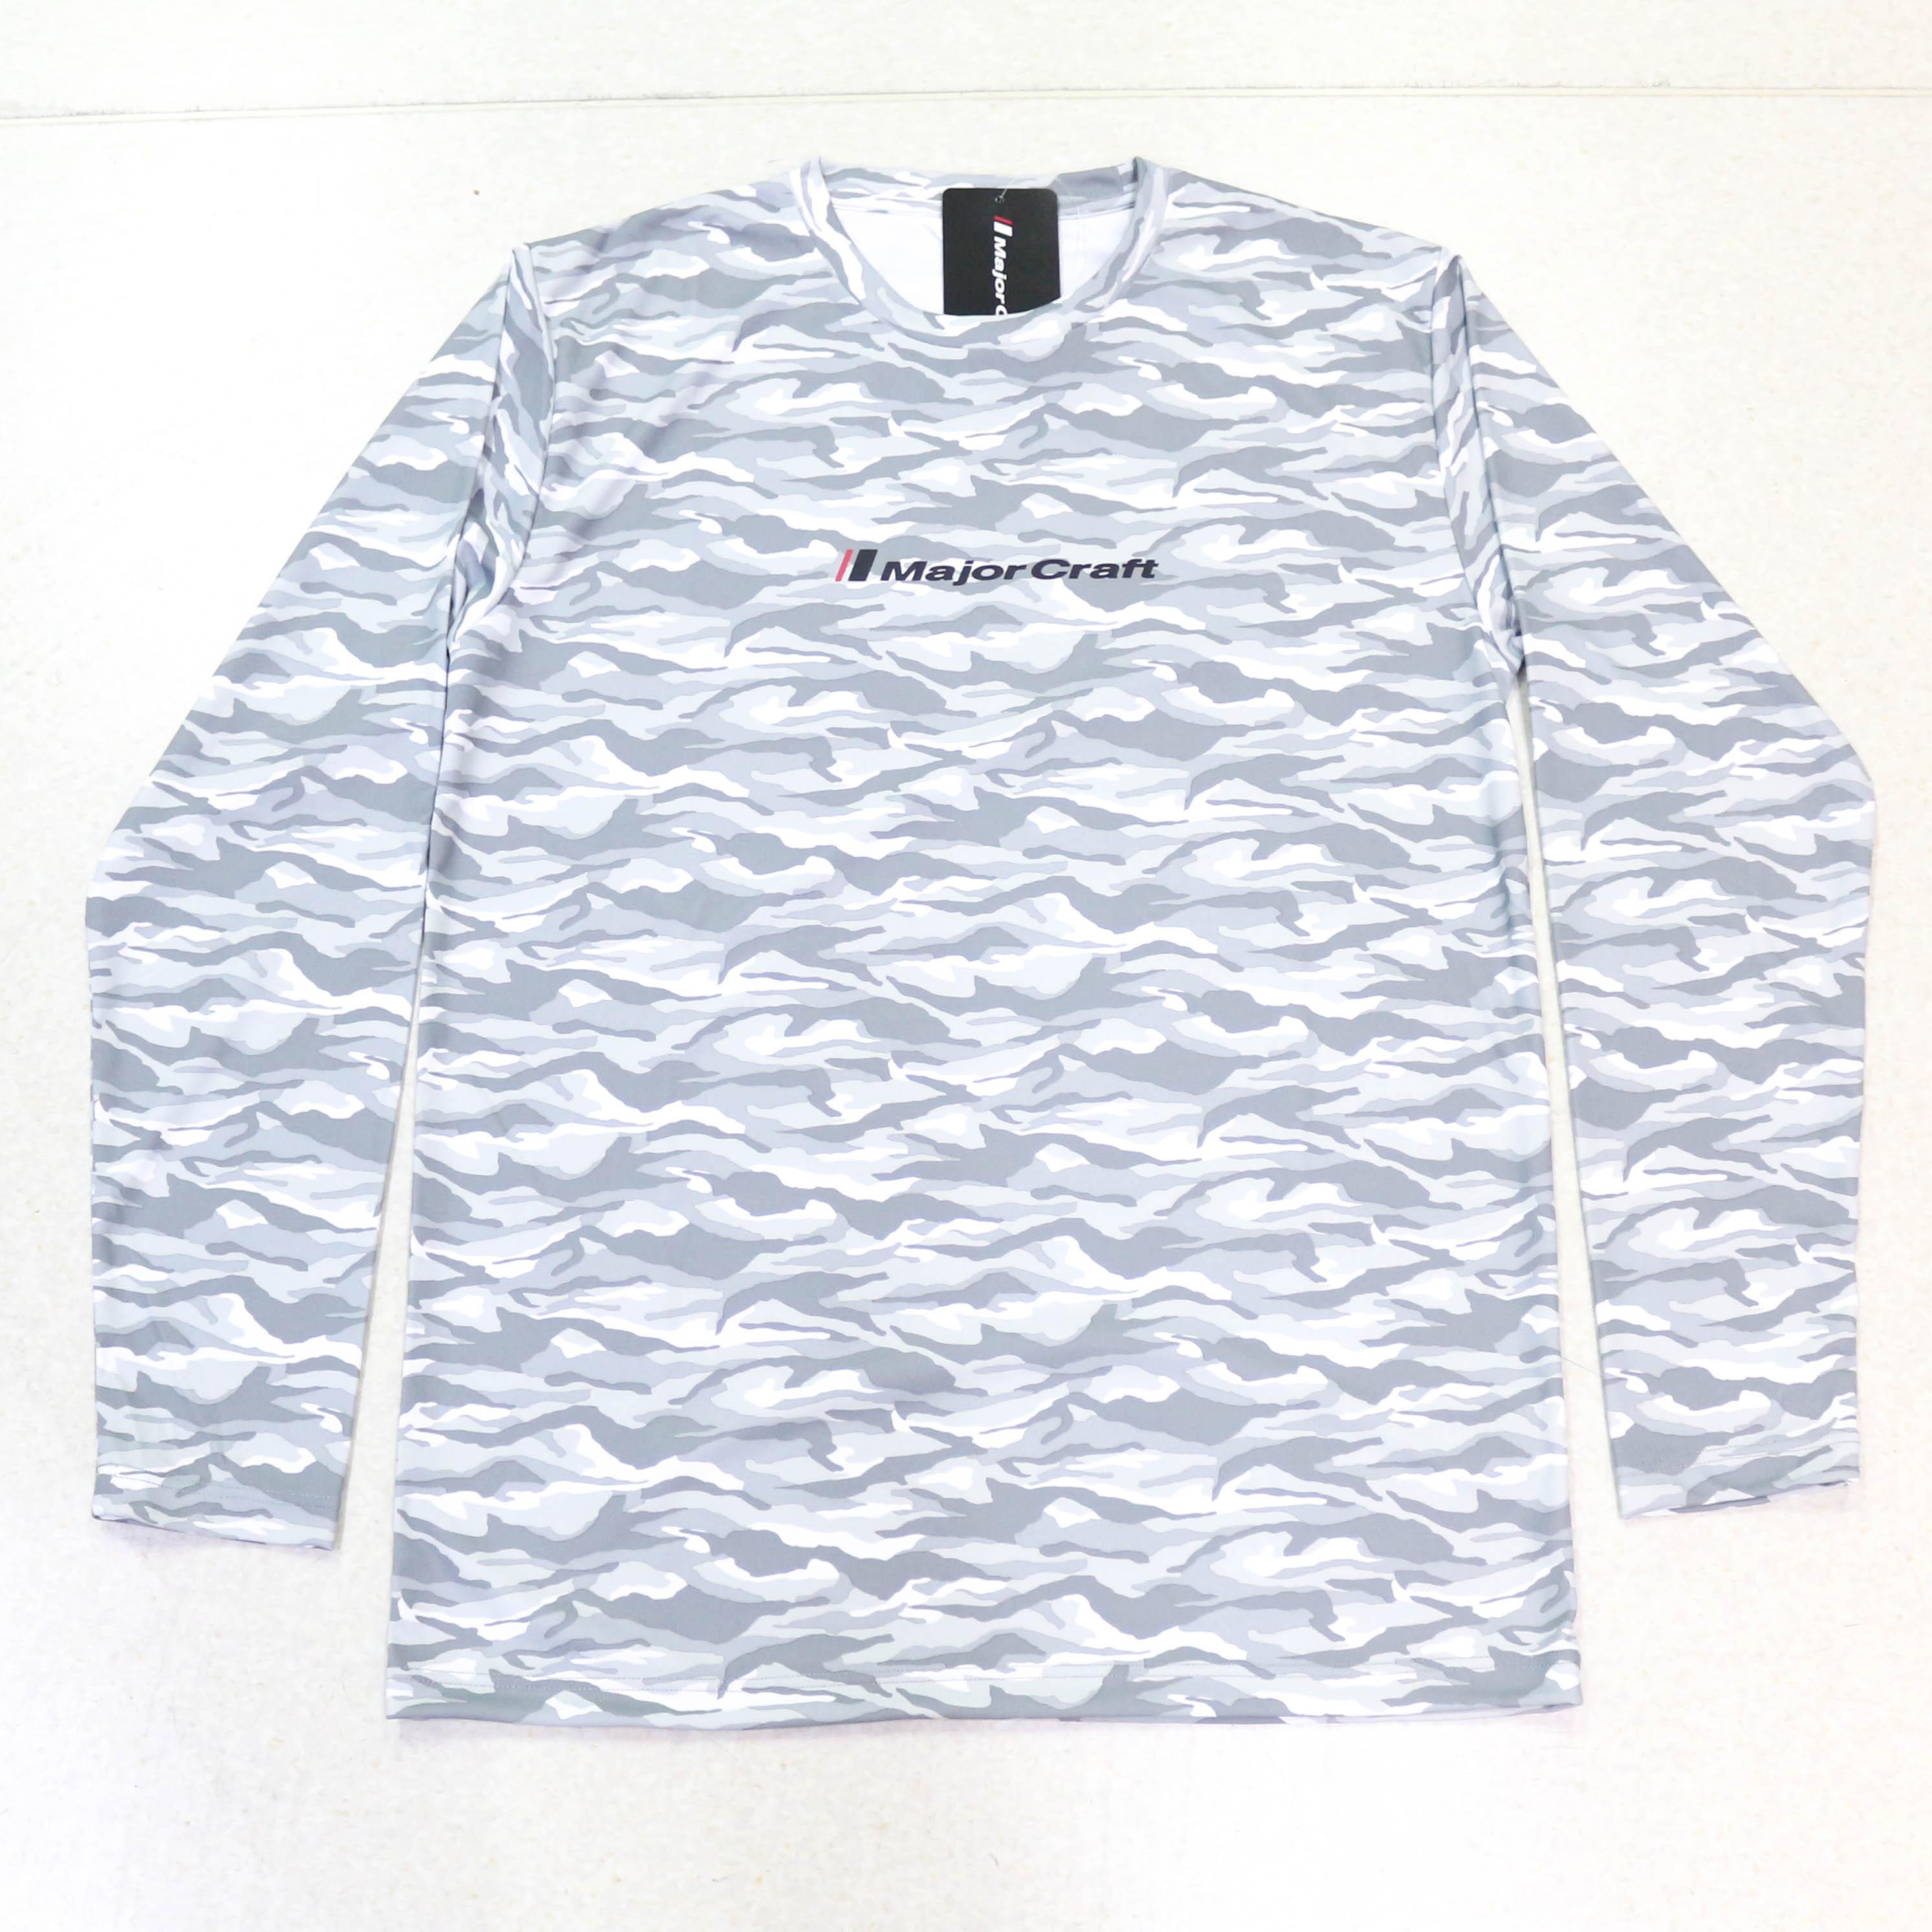 Major Craft T-Shirt Long Sleeve MCW-DLT-M/GCM (3086)